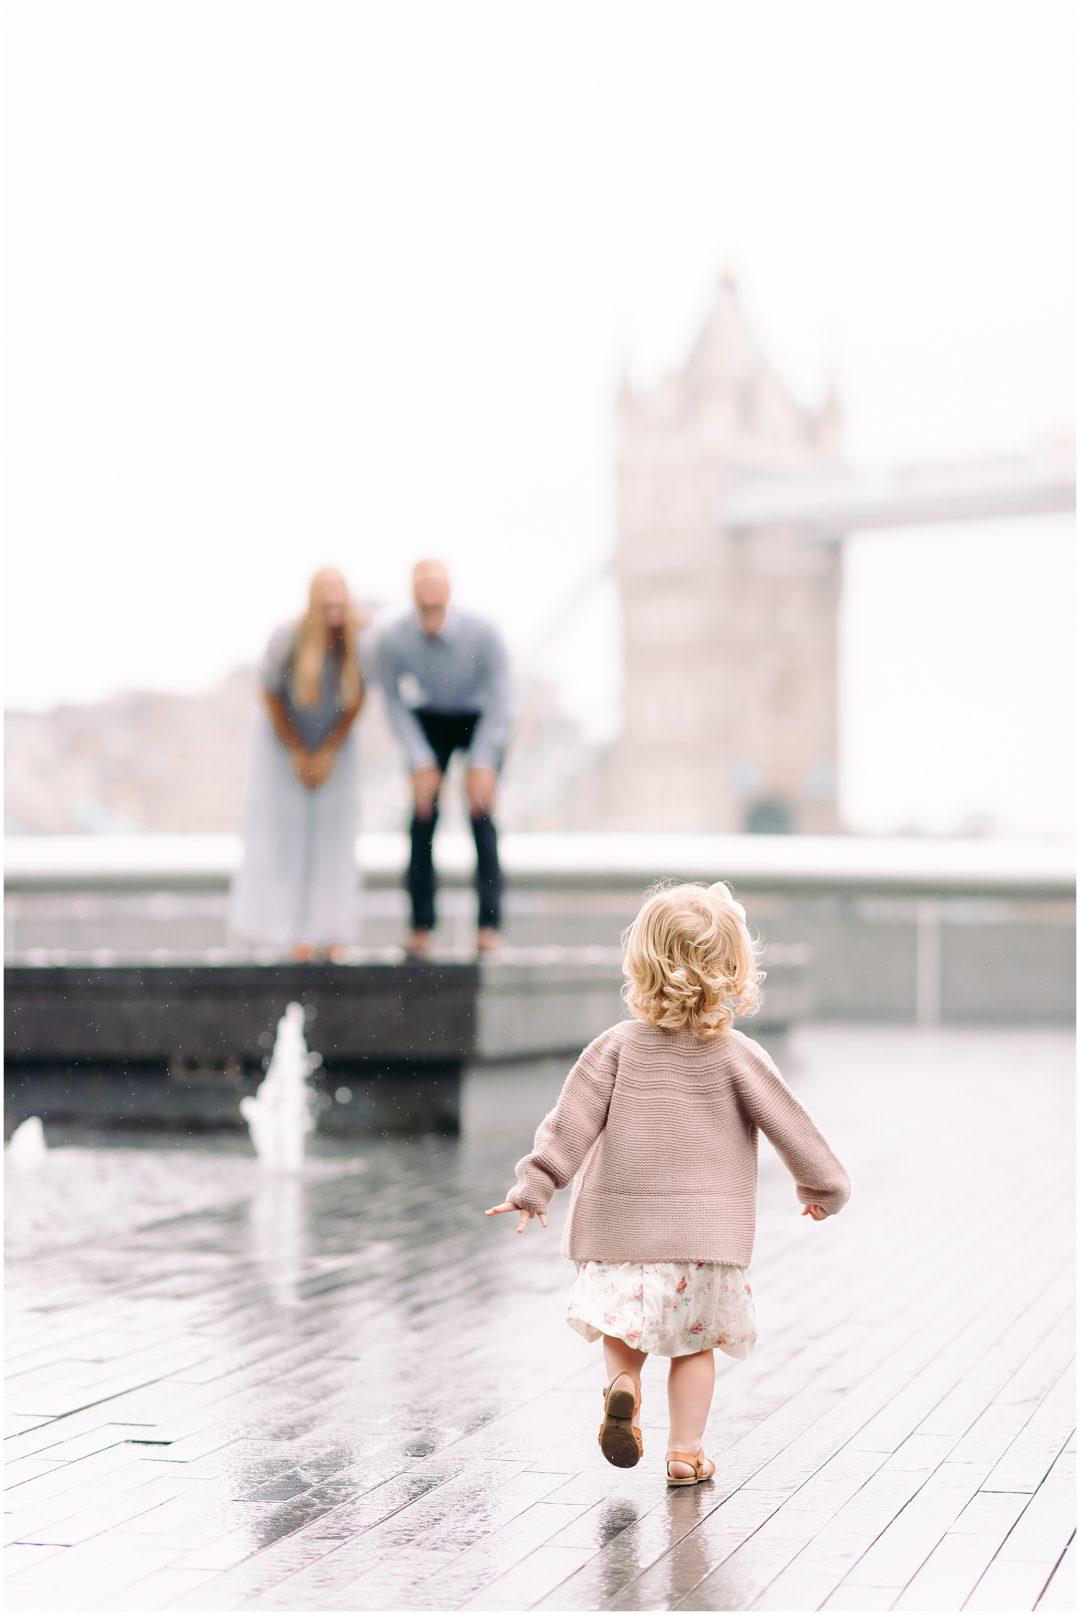 London family photographer, Tower Bridge - family - London family photographer Tower Bridge family shoot Nkimaphotography 0007